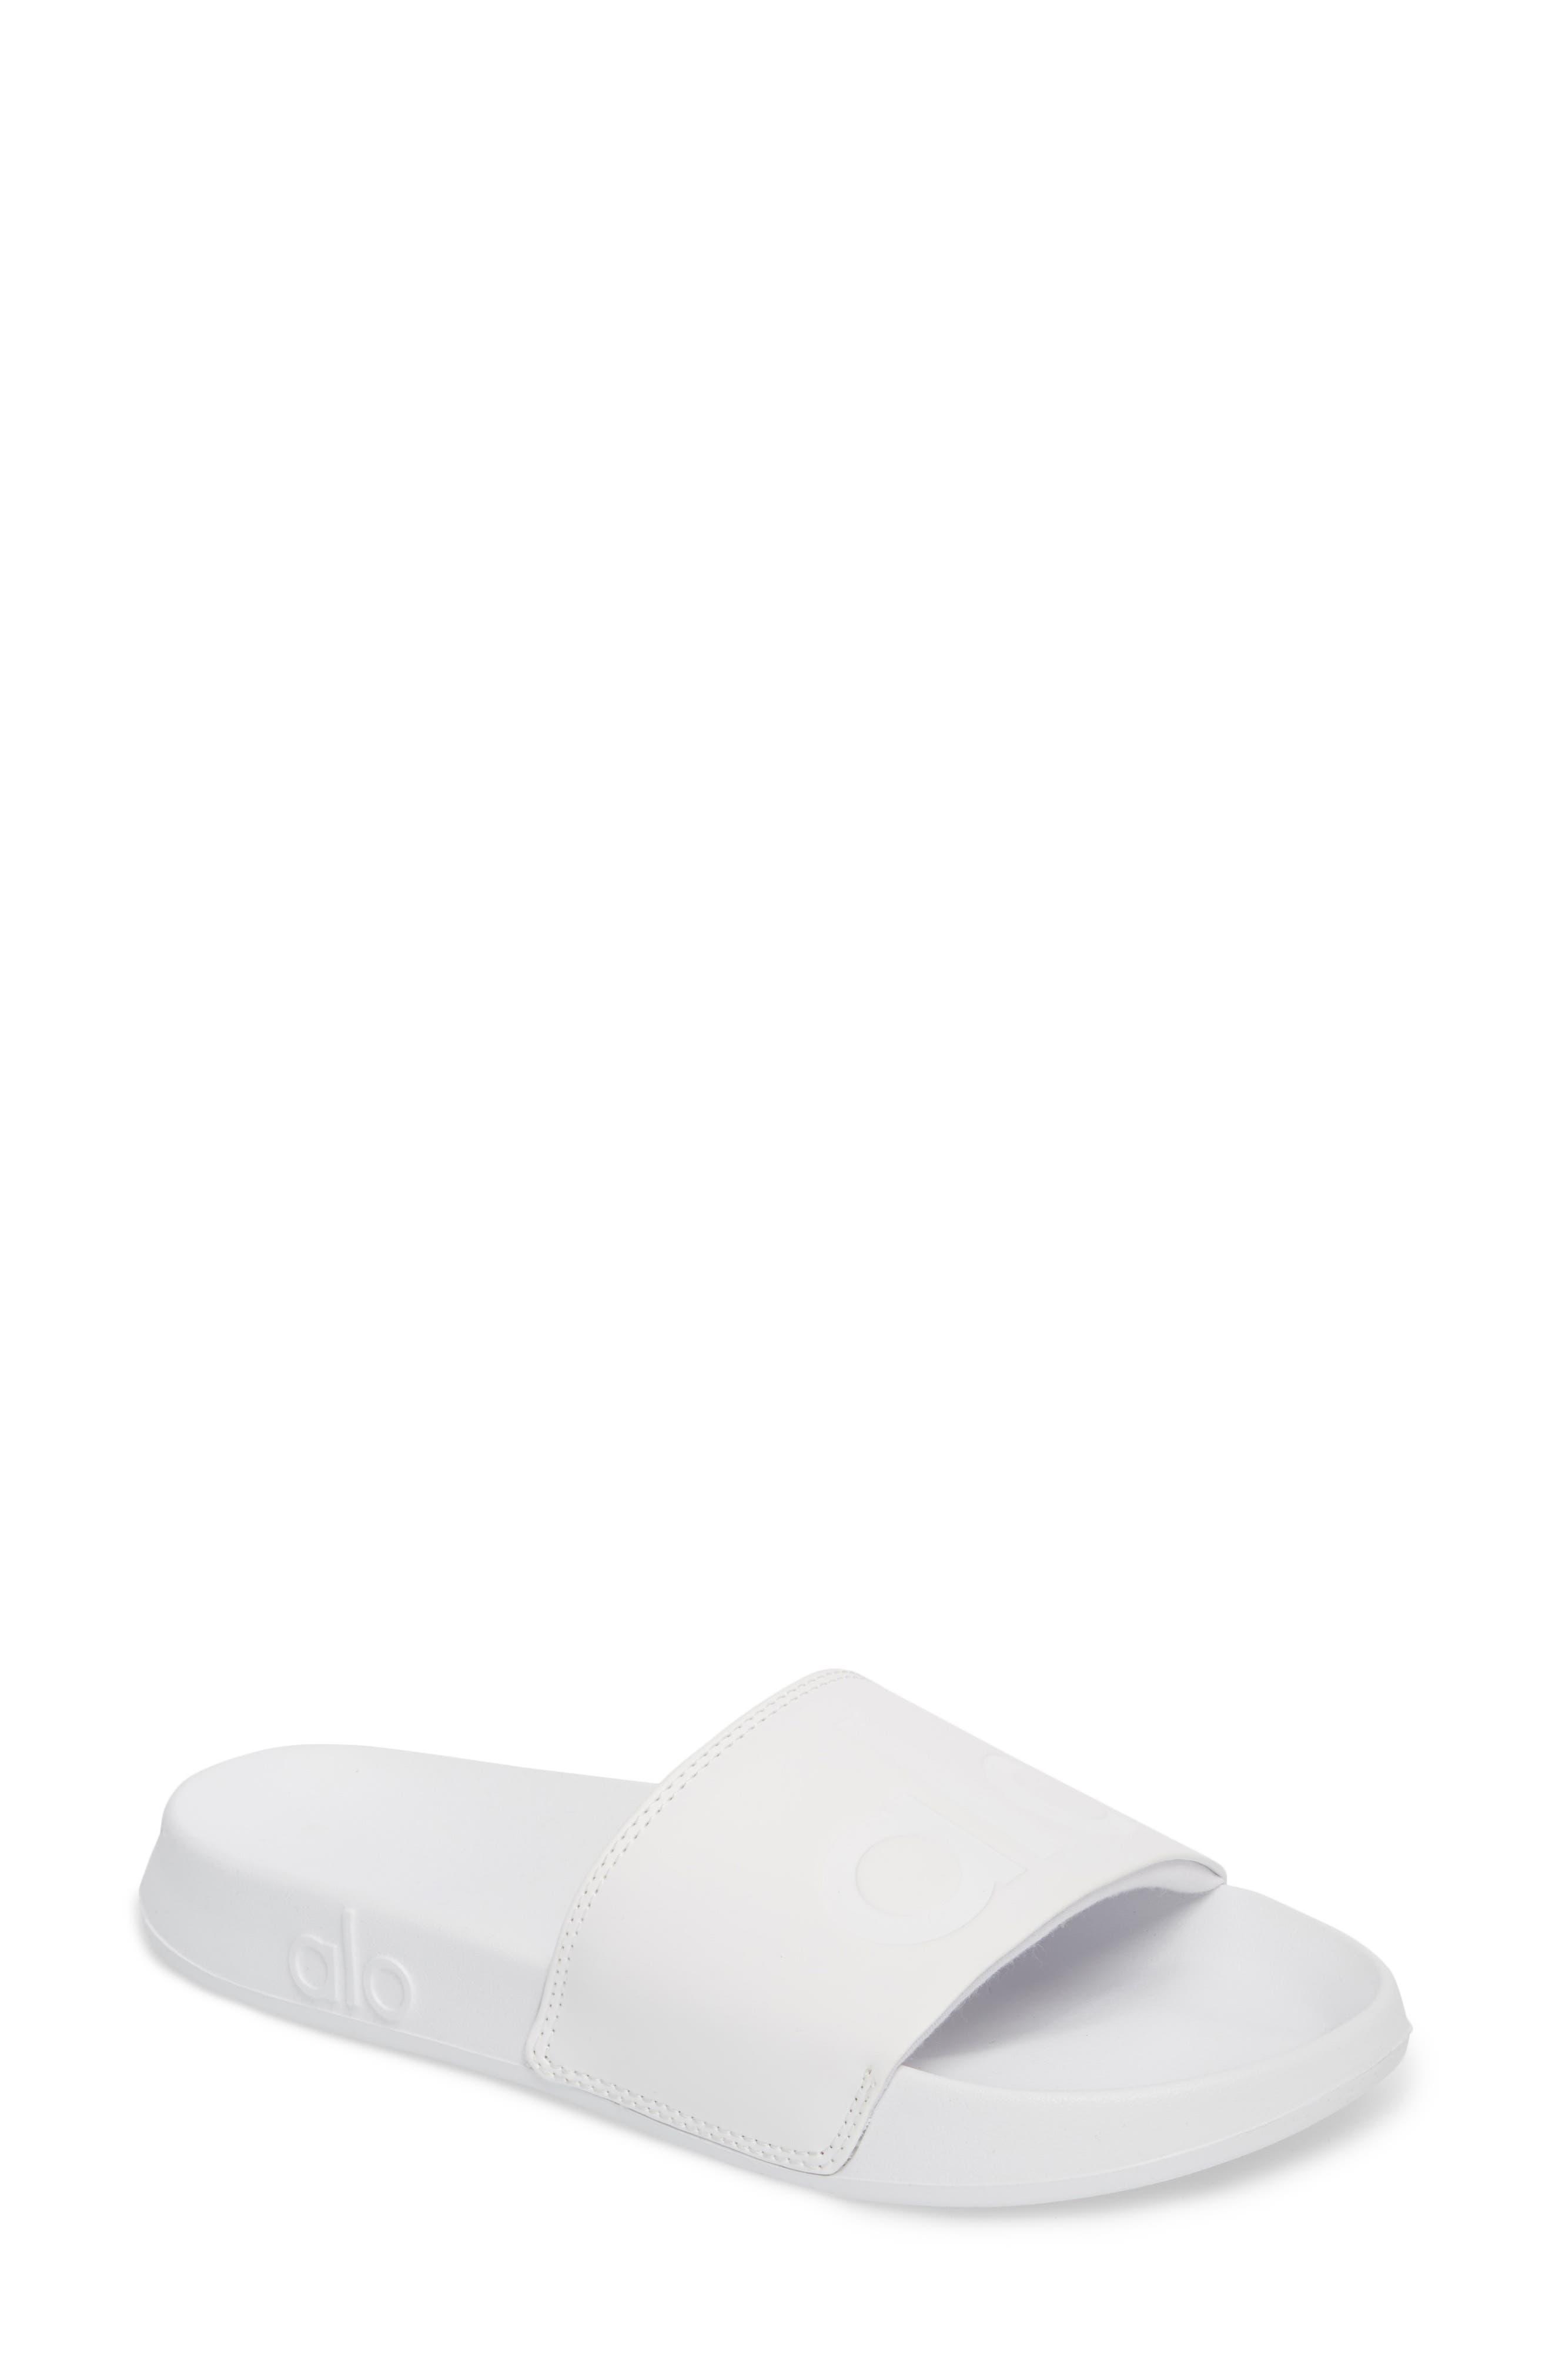 It 2 Sandal,                         Main,                         color, White/ White